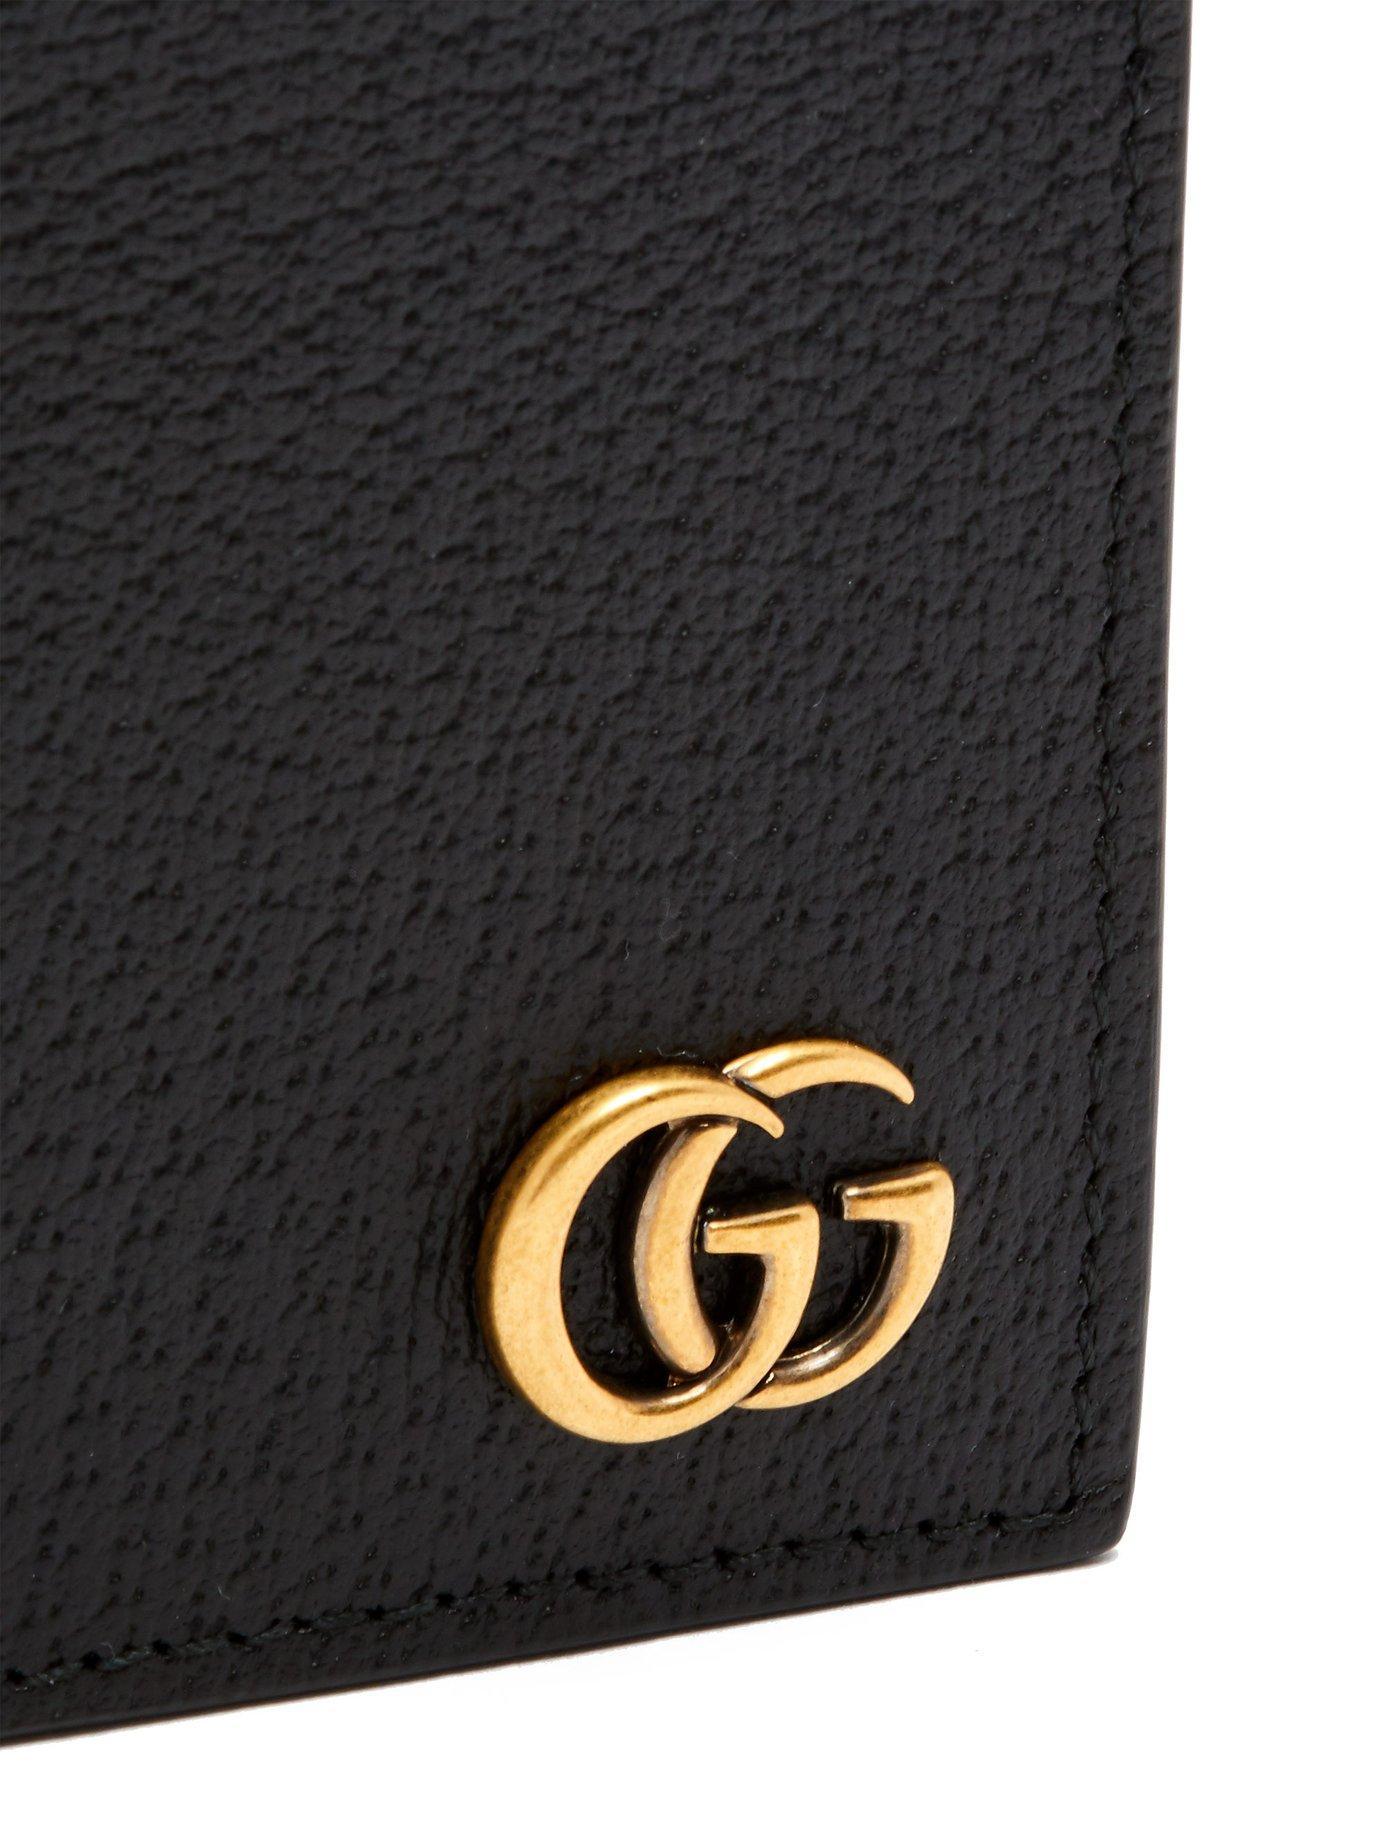 50661c63f5e5 Gucci - Black Gg Marmont Grained Leather Bi Fold Wallet for Men - Lyst.  View fullscreen